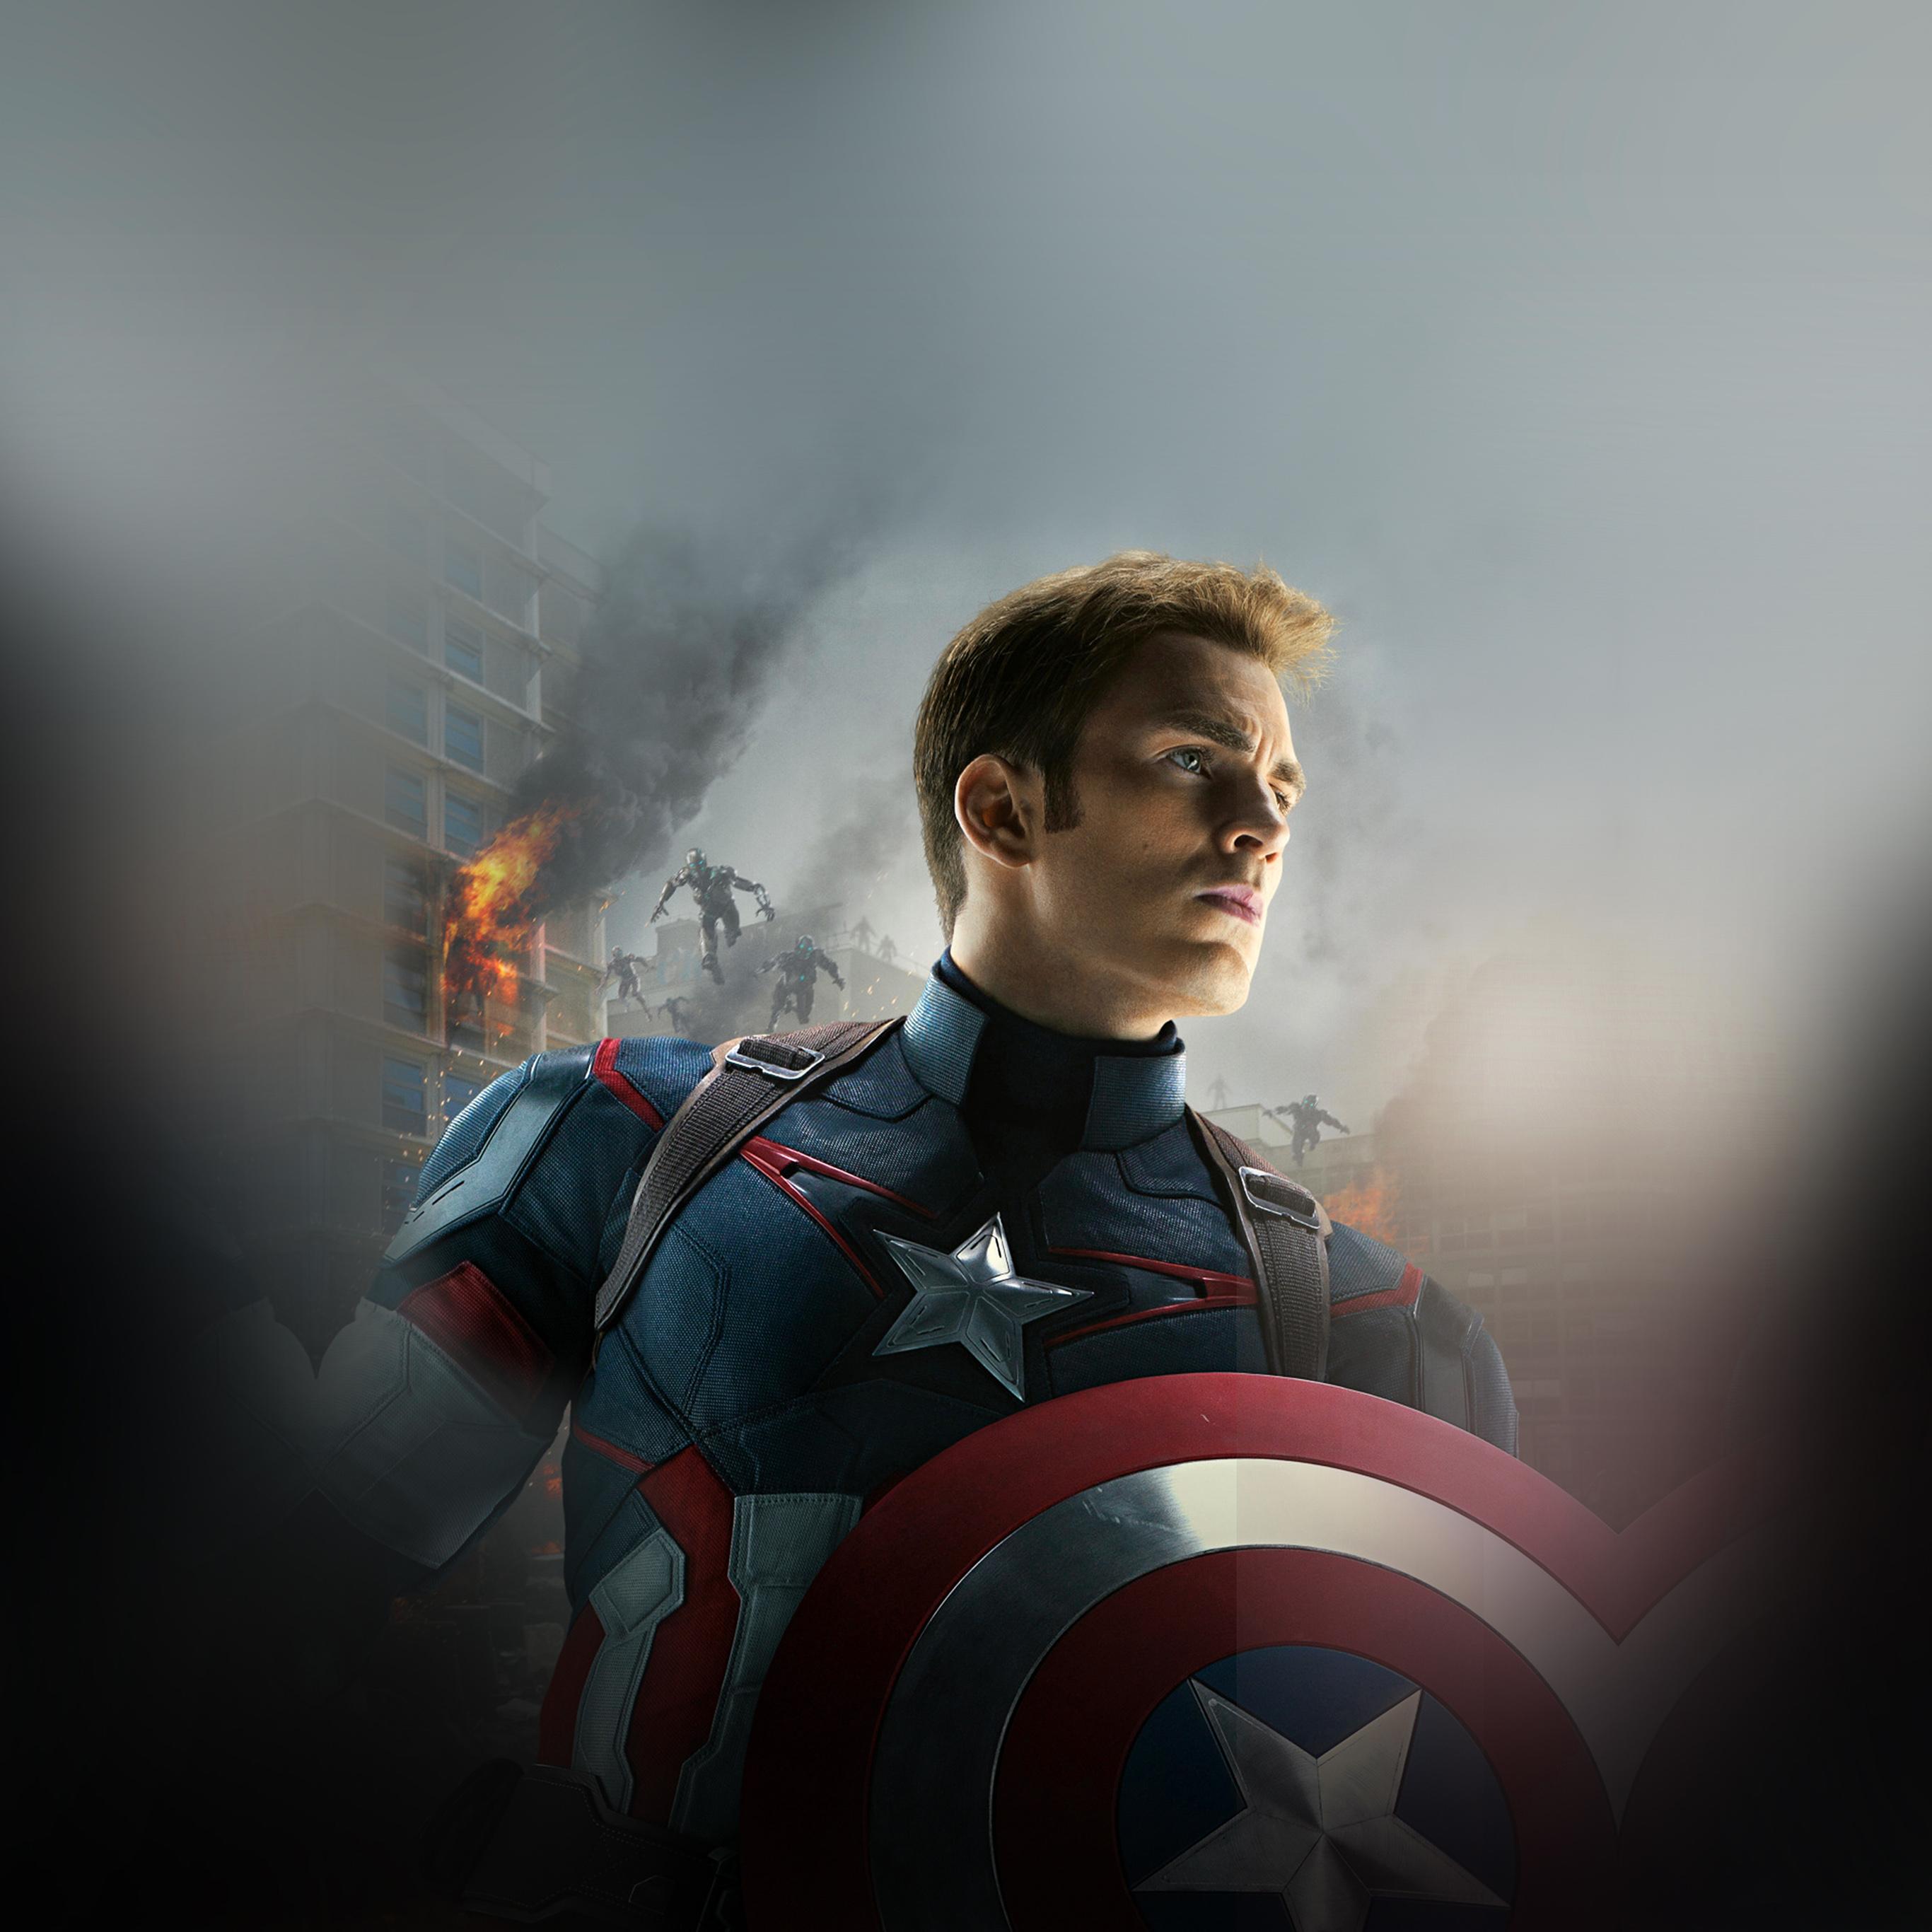 ak81-avengers-age-of-ultron-captain-america-chris-evans